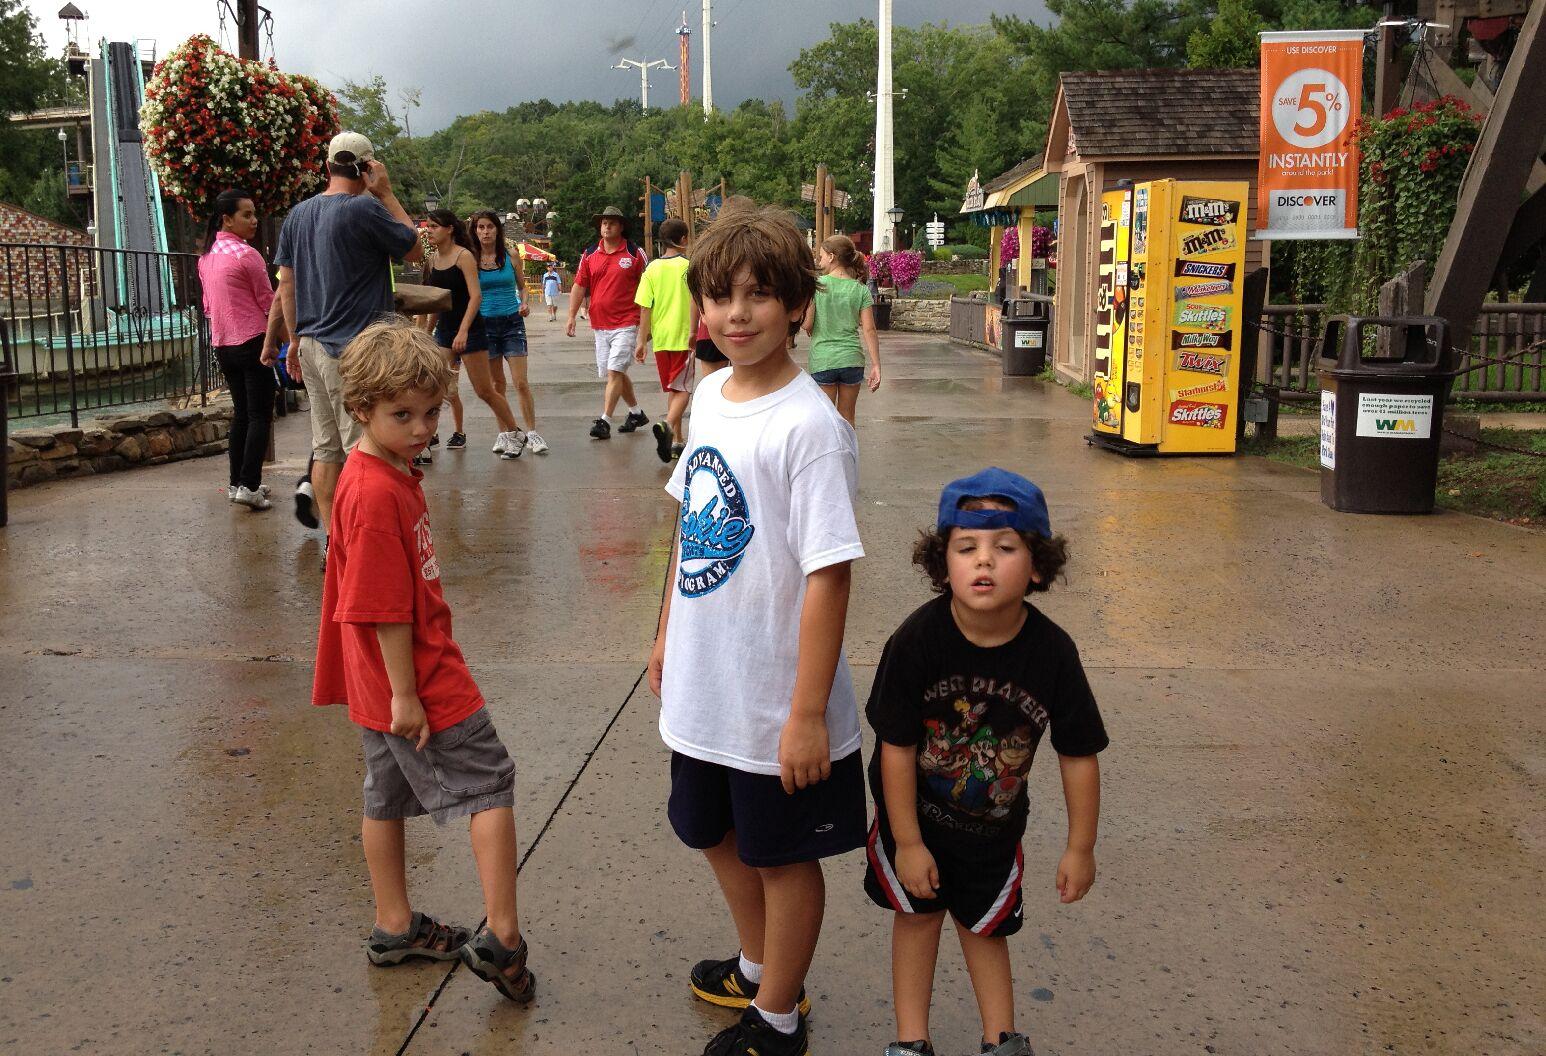 3 boys standing in park